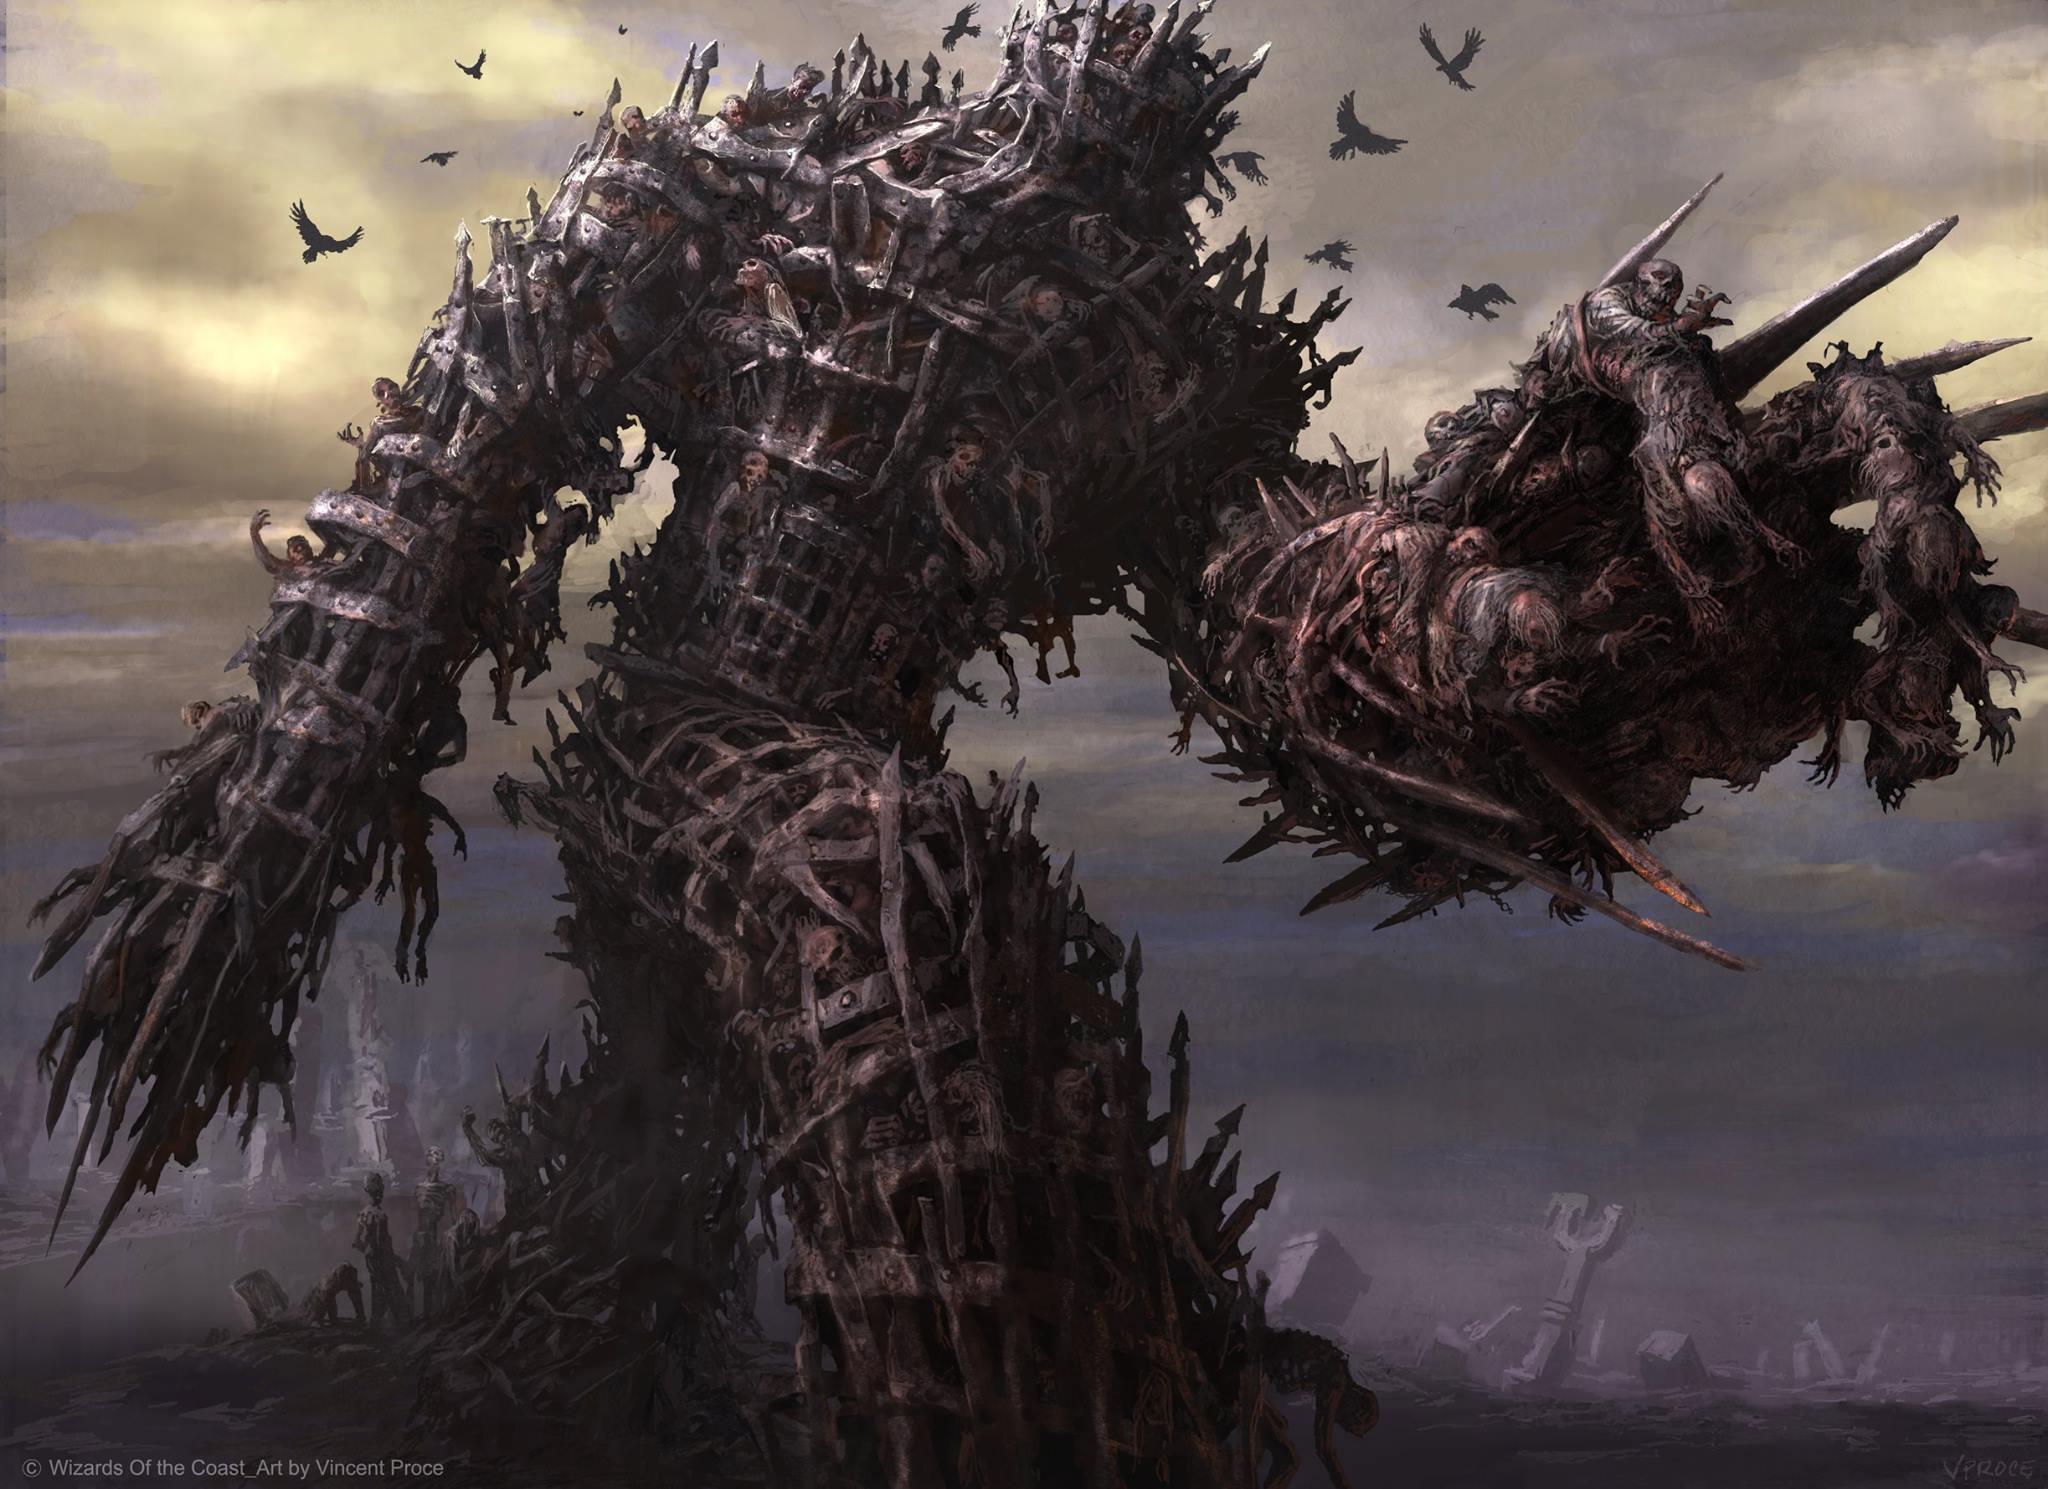 Diregraf-Colossus-Shadows-over-Innistrad-Art